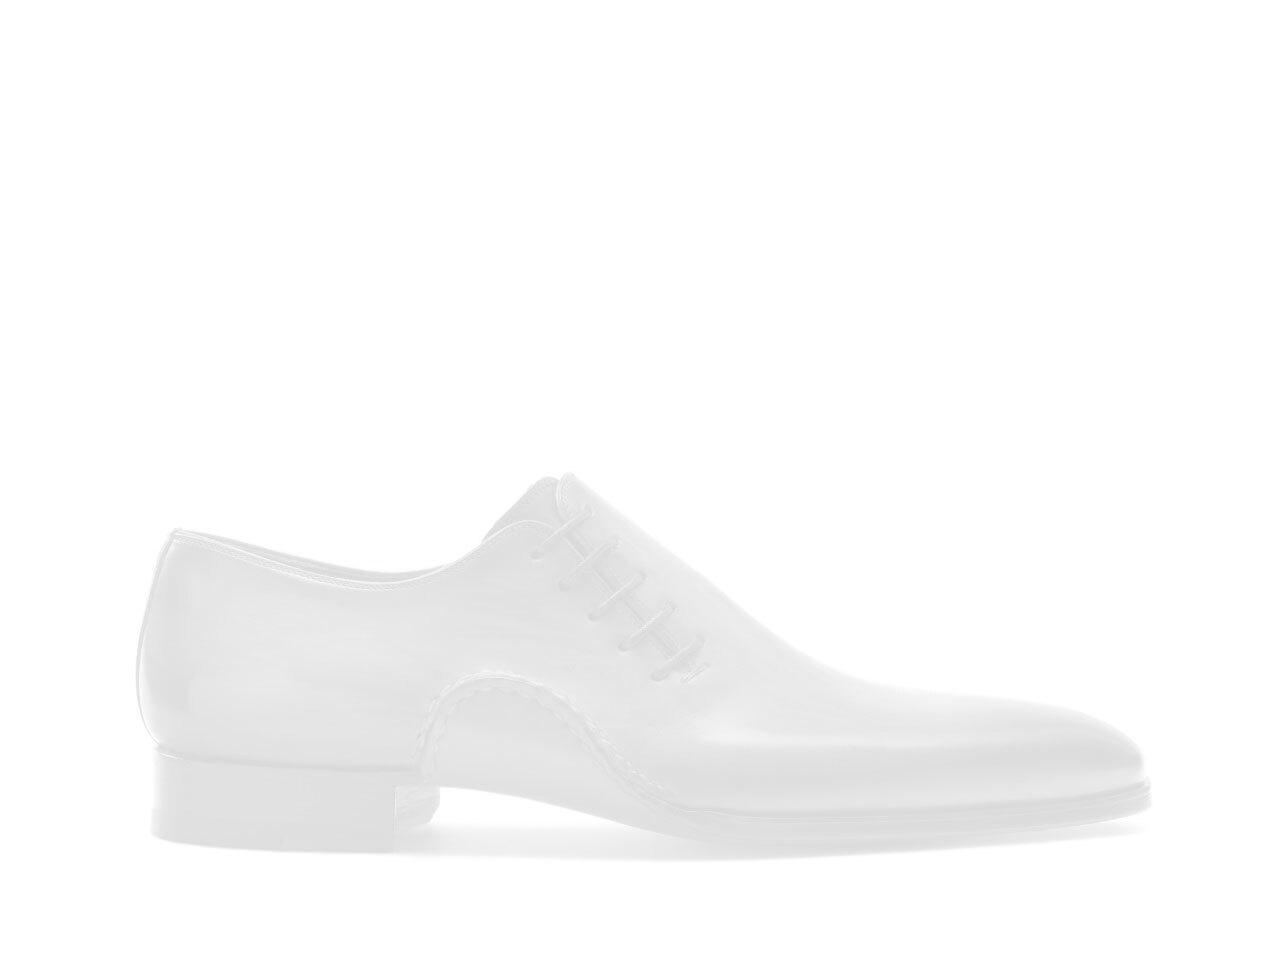 Side view of the Magnanni Efren Black Men's Single Monk Strap Shoes